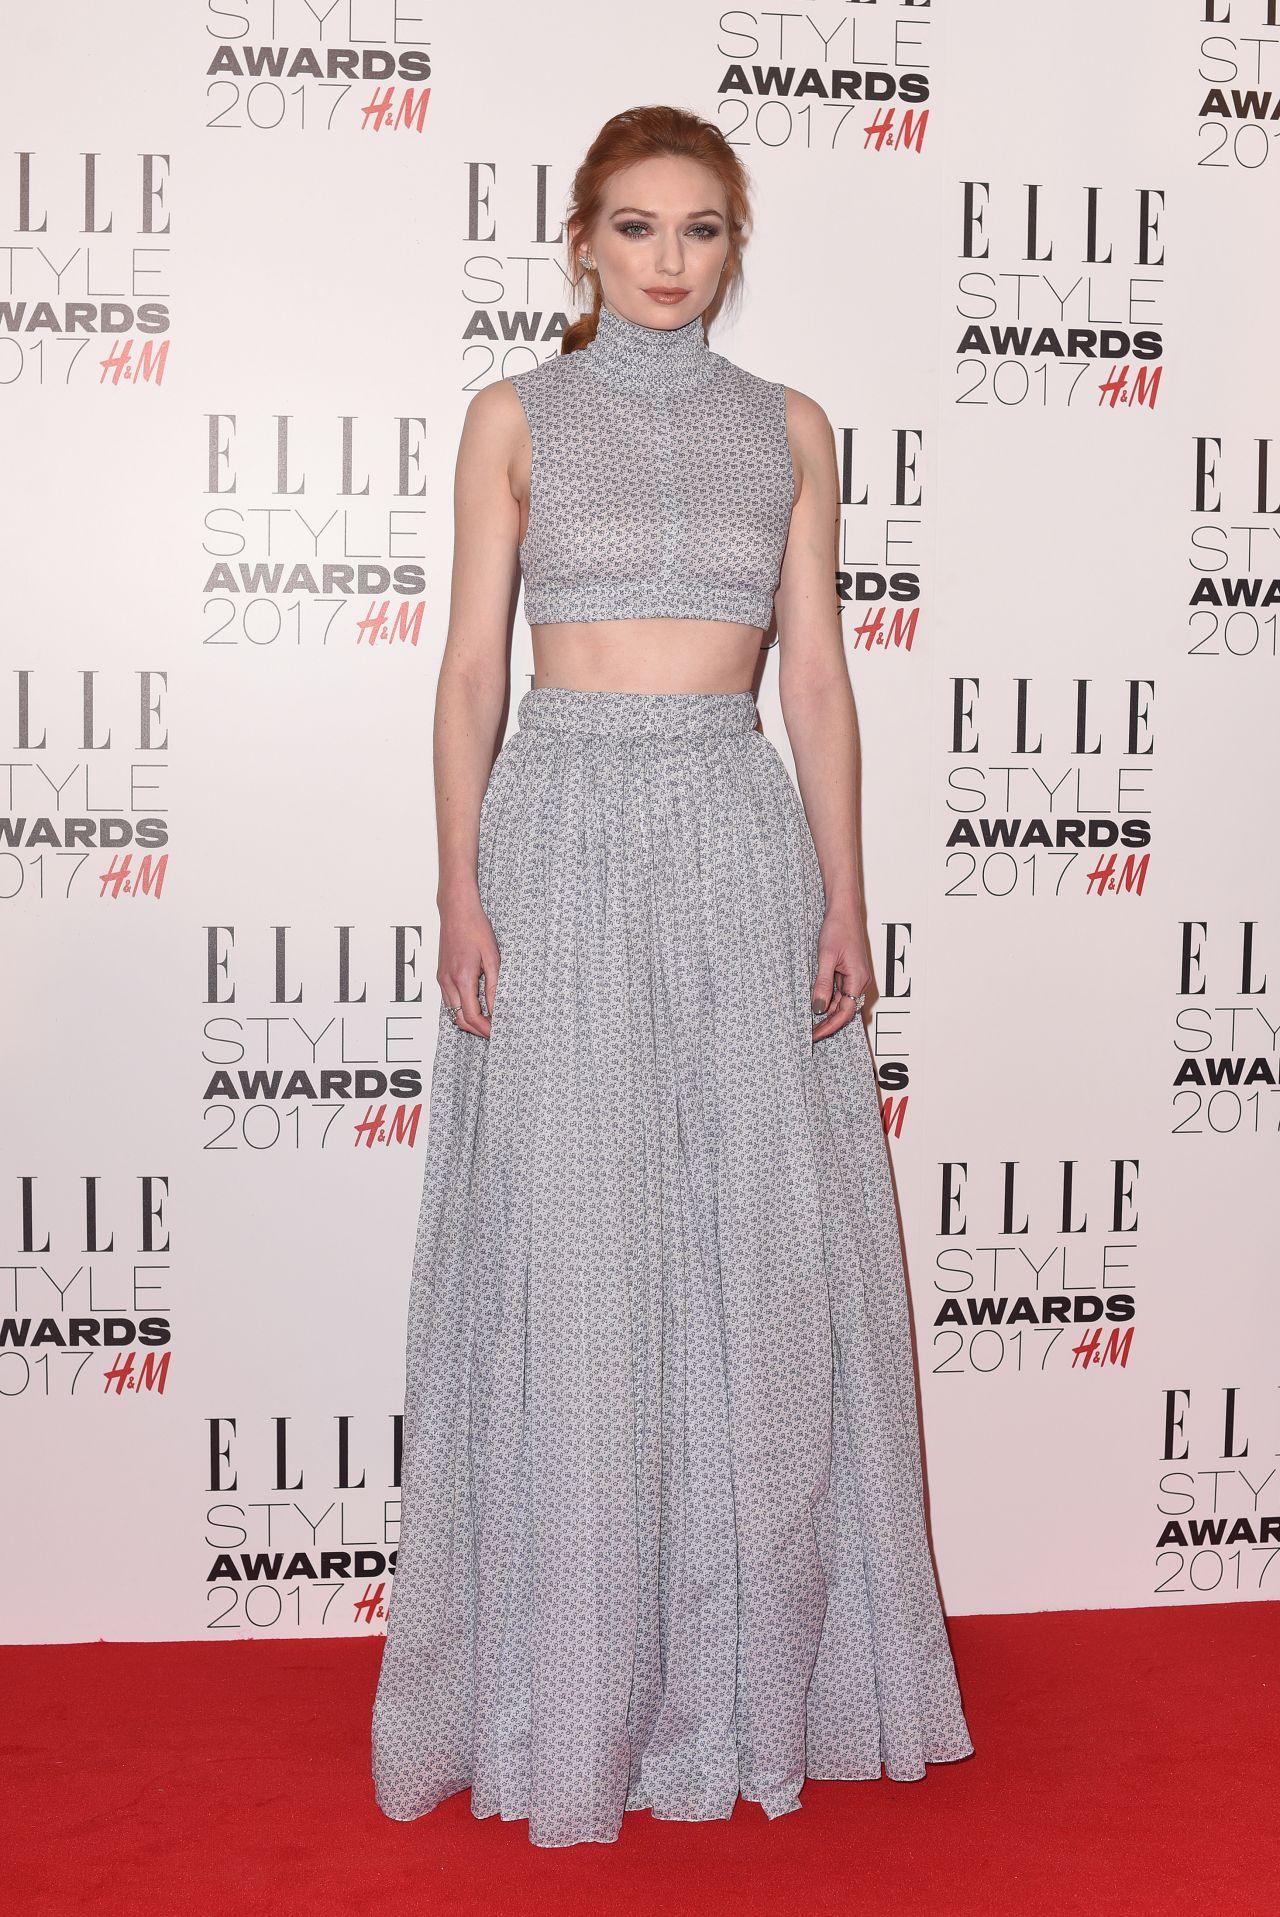 http://celebmafia.com/wp-content/uploads/2017/02/eleanor-tomlinson-elle-style-awards-in-london-2-13-2017-2.jpg